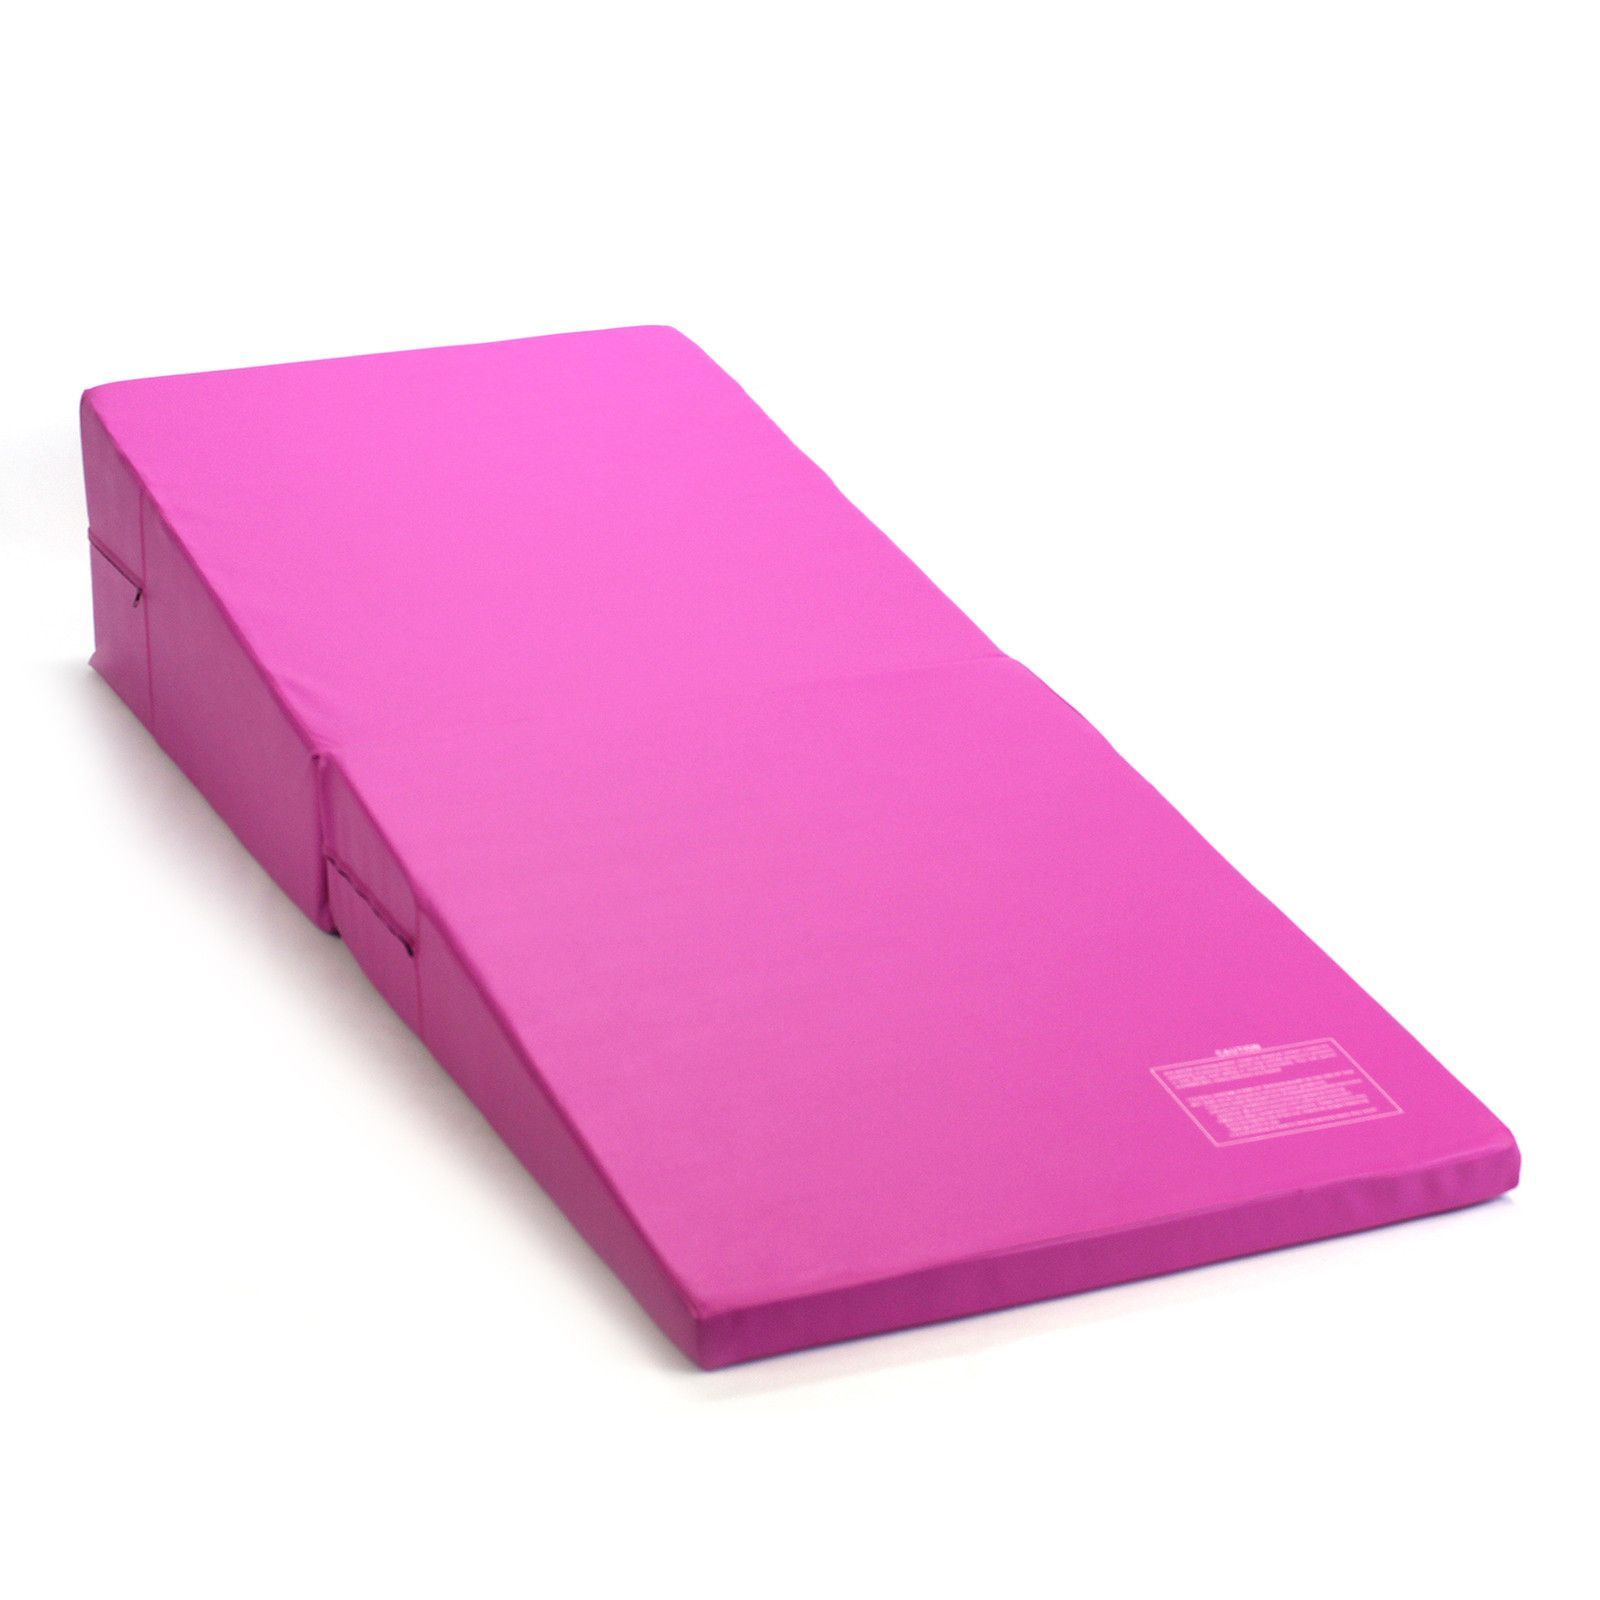 Pink Folding Incline Gymnastics Mat Training Foam Triangle Gym Tumblin Commercial Bargains Inc Tumbling Gymnastics Gymnastics Mats Mat Training